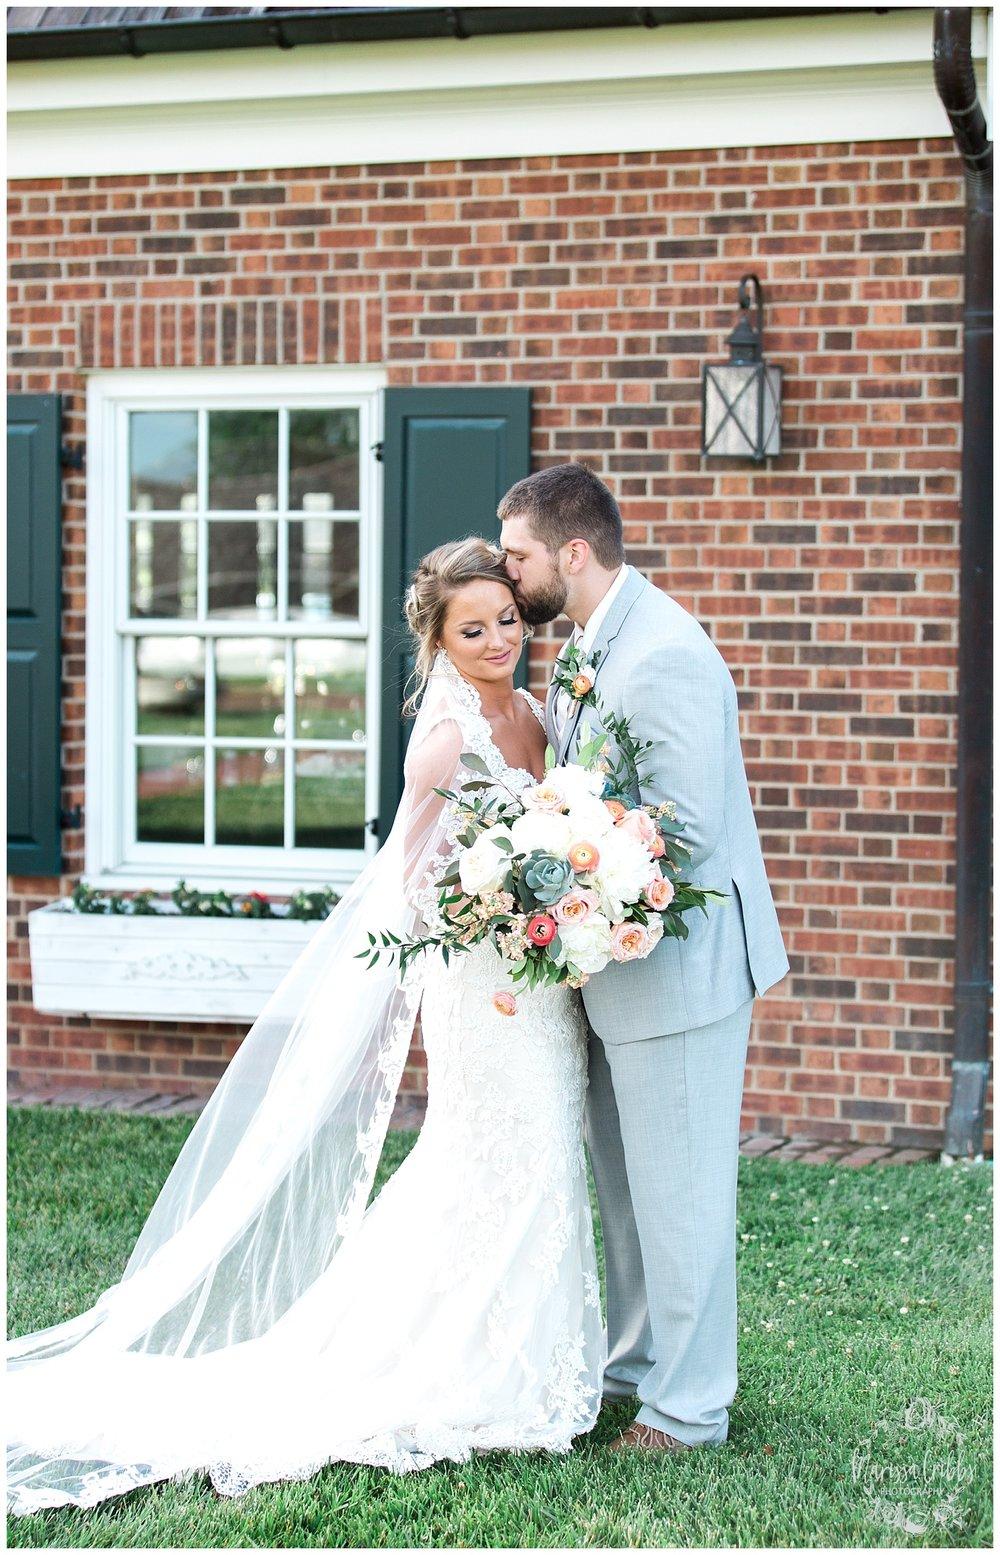 CHELSEY & TRAVIS MARRIED | MILDALE FARM WEDDING | KC WEDDING PHOTOGRAPHERS | MARISSA CRIBBS PHOTOGRAPHY_1313.jpg